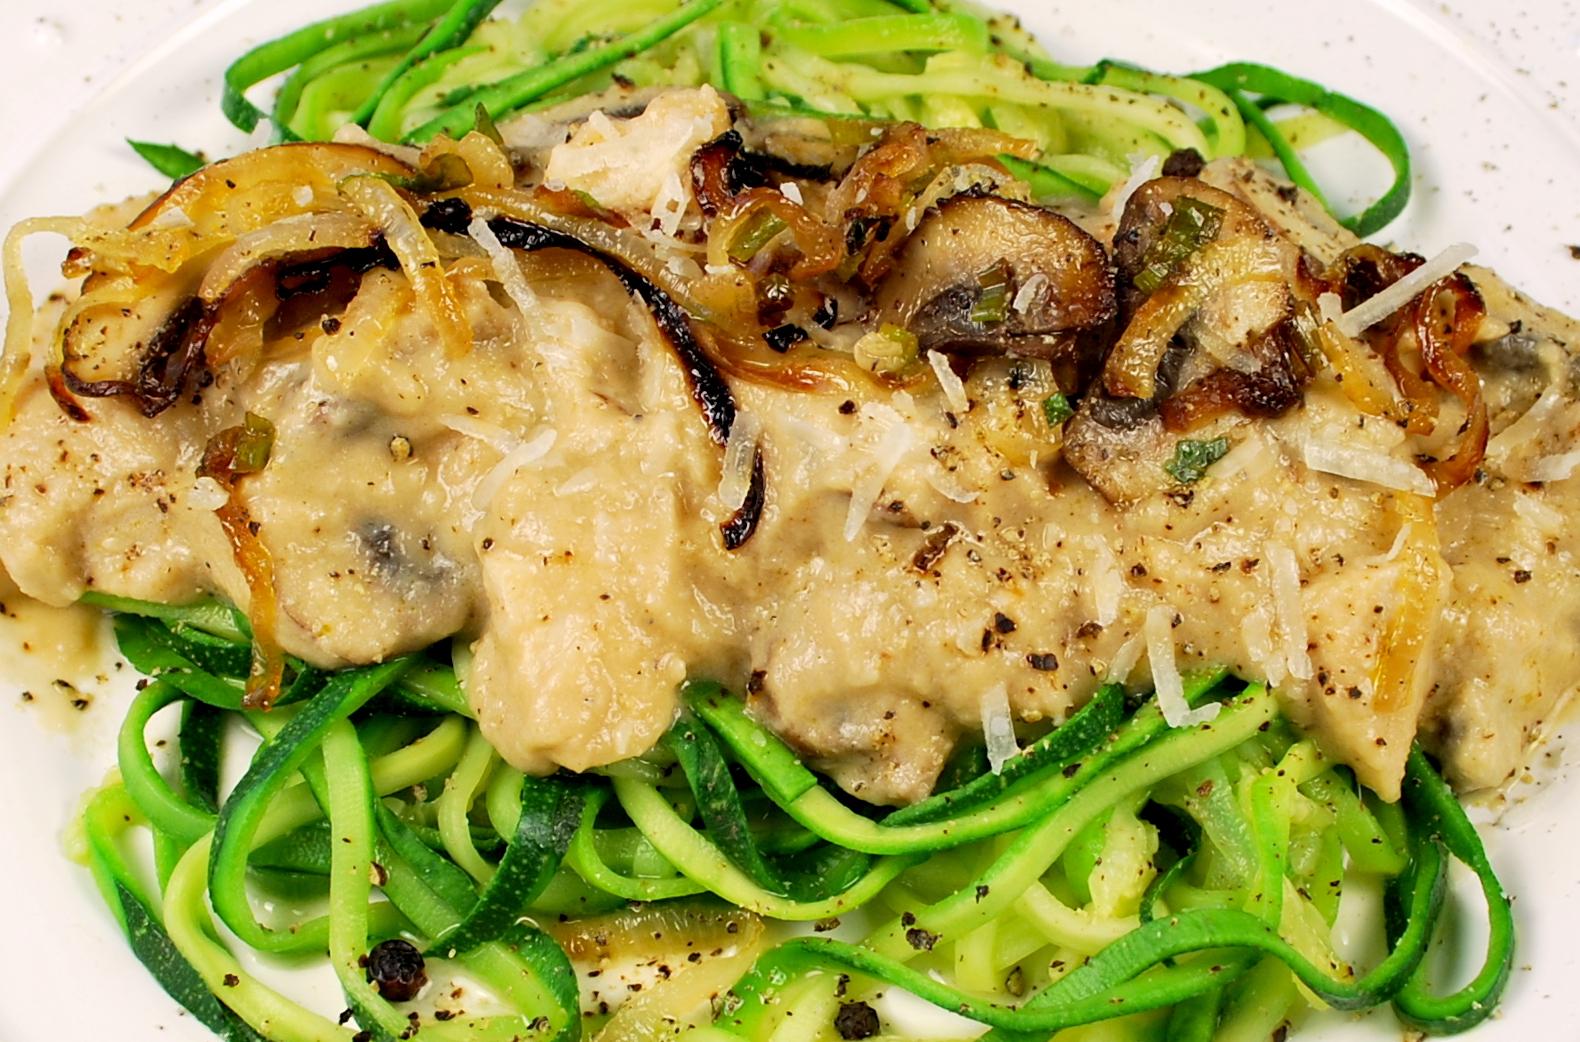 spiralizing recipes - creamy zucchini chicken